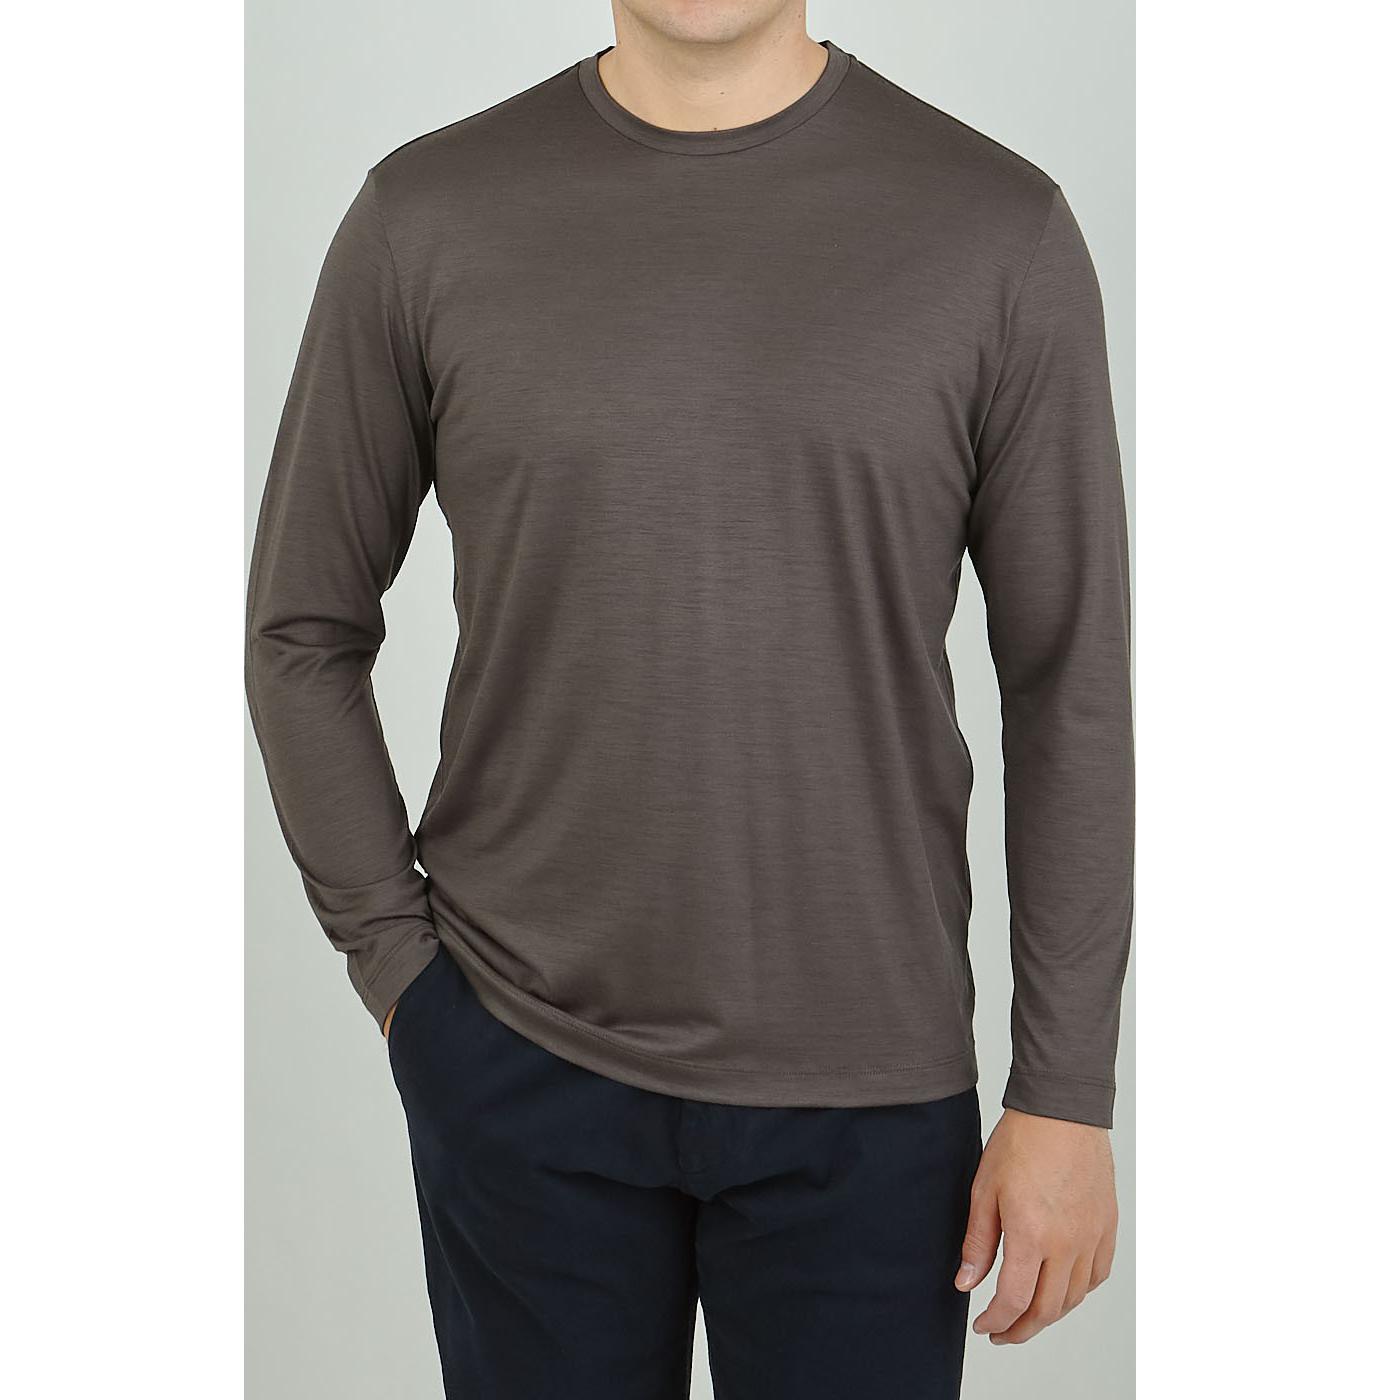 Maurizio Baldassari Brown Active Wool Jersey T-shirt Front